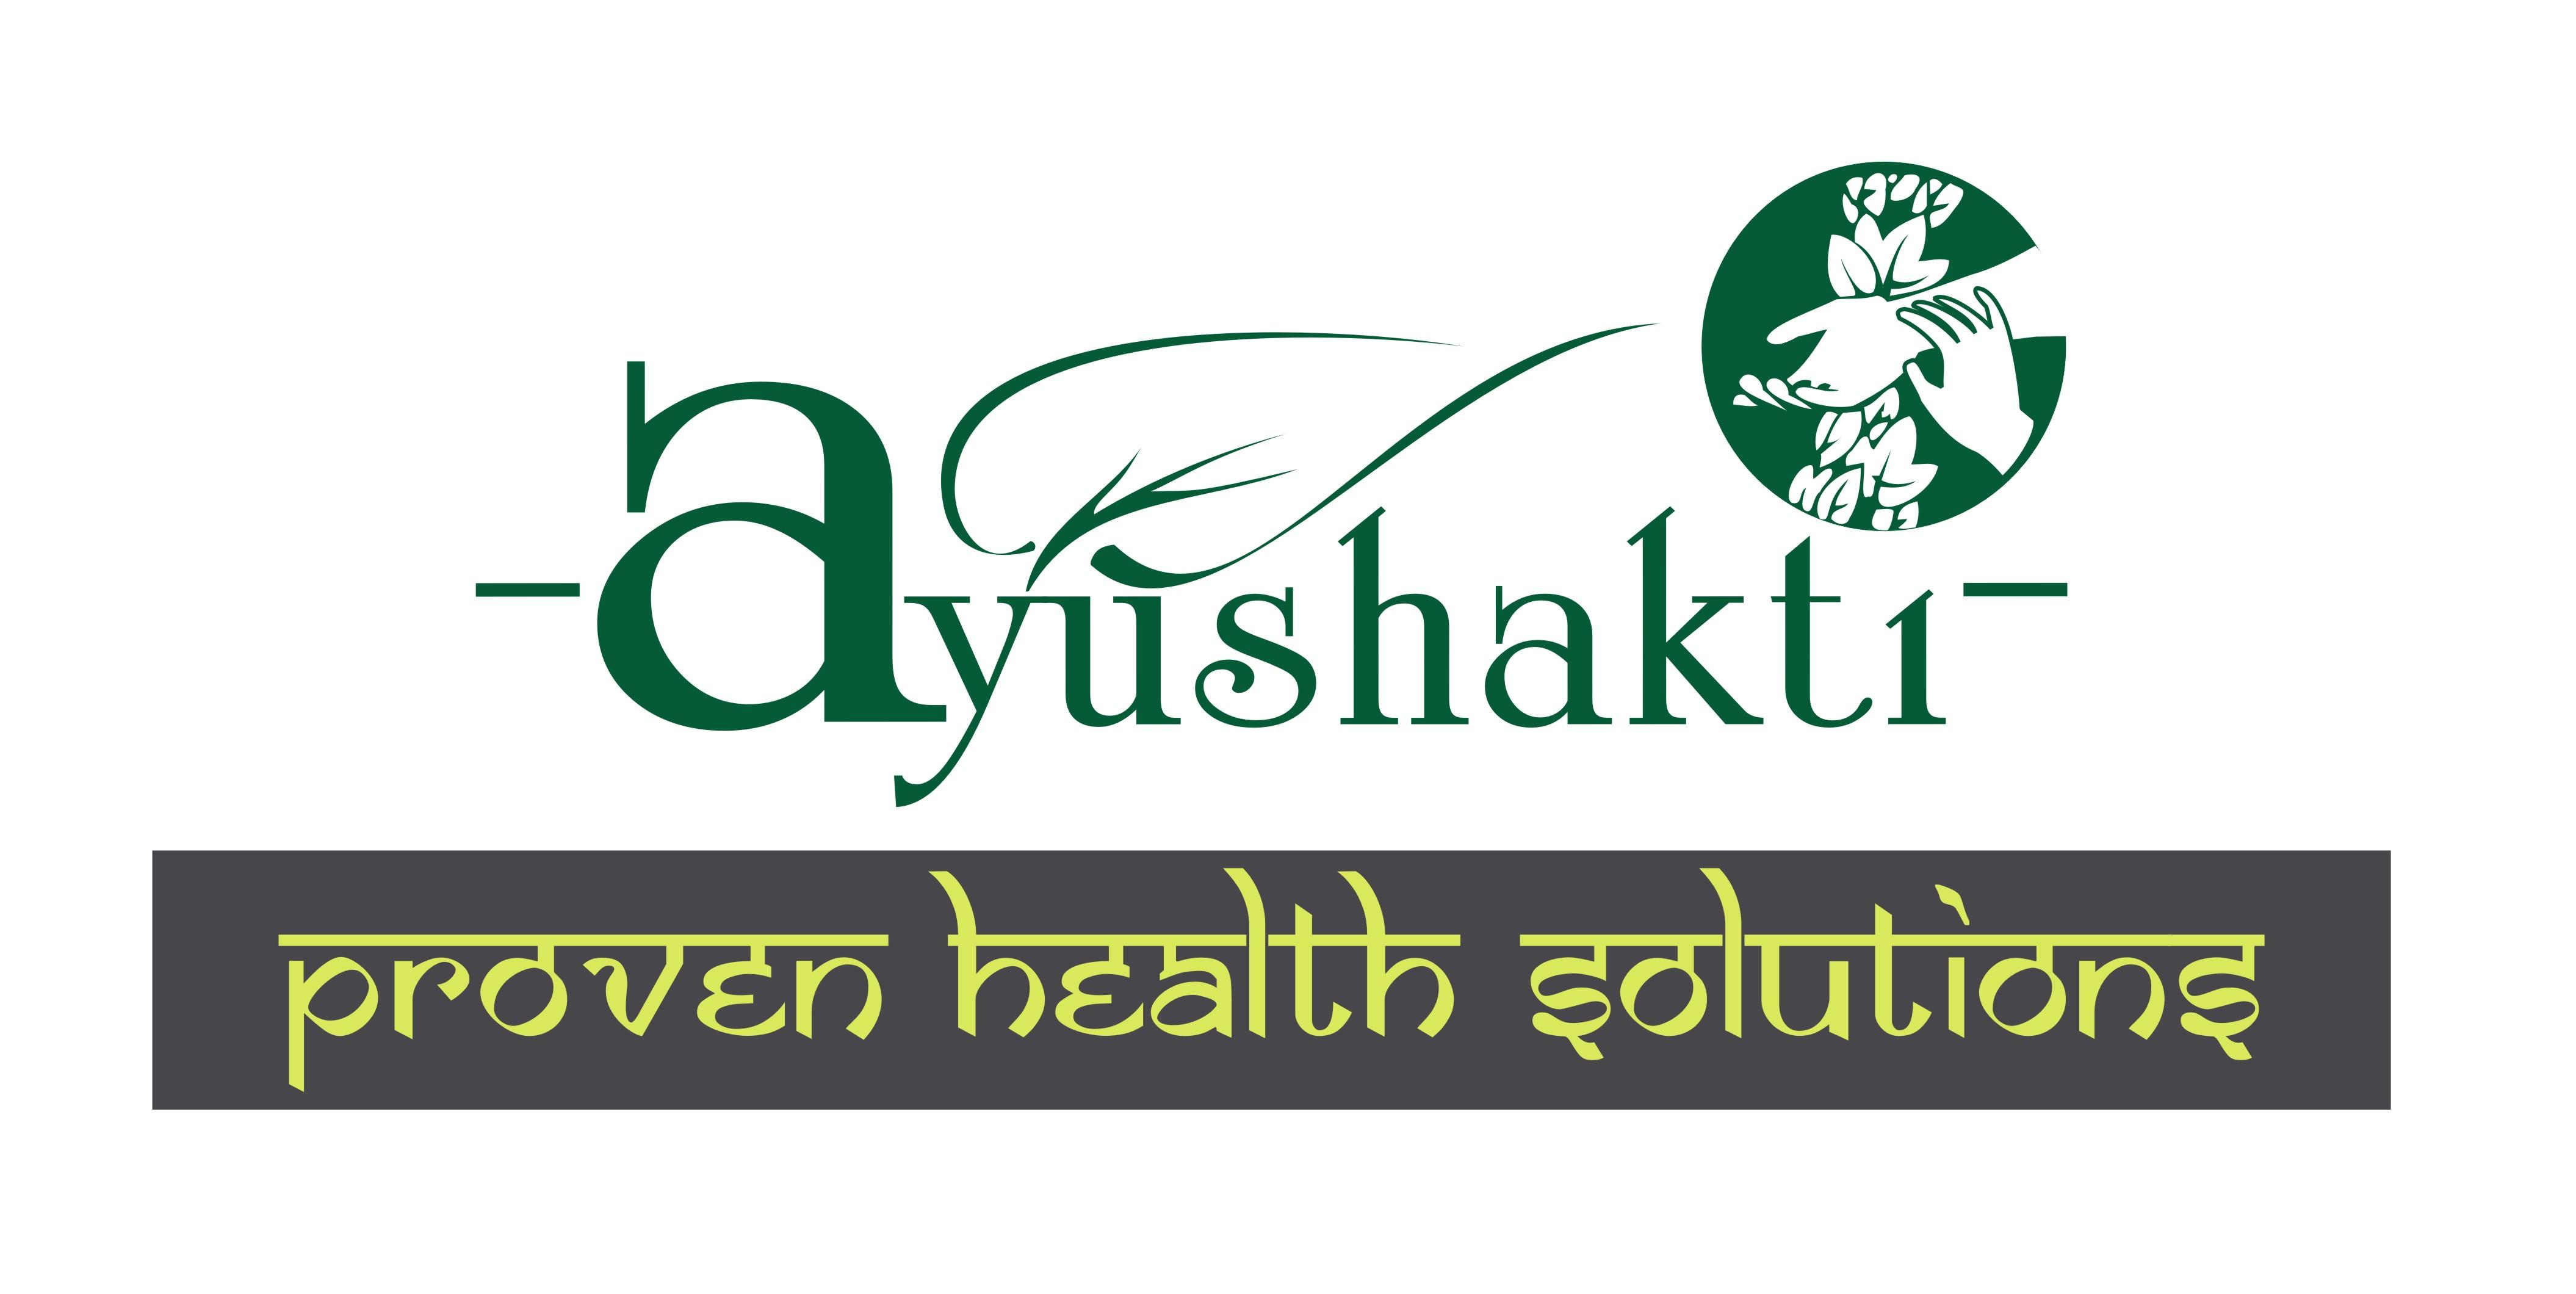 Ayushakti Ayurved Health Centre